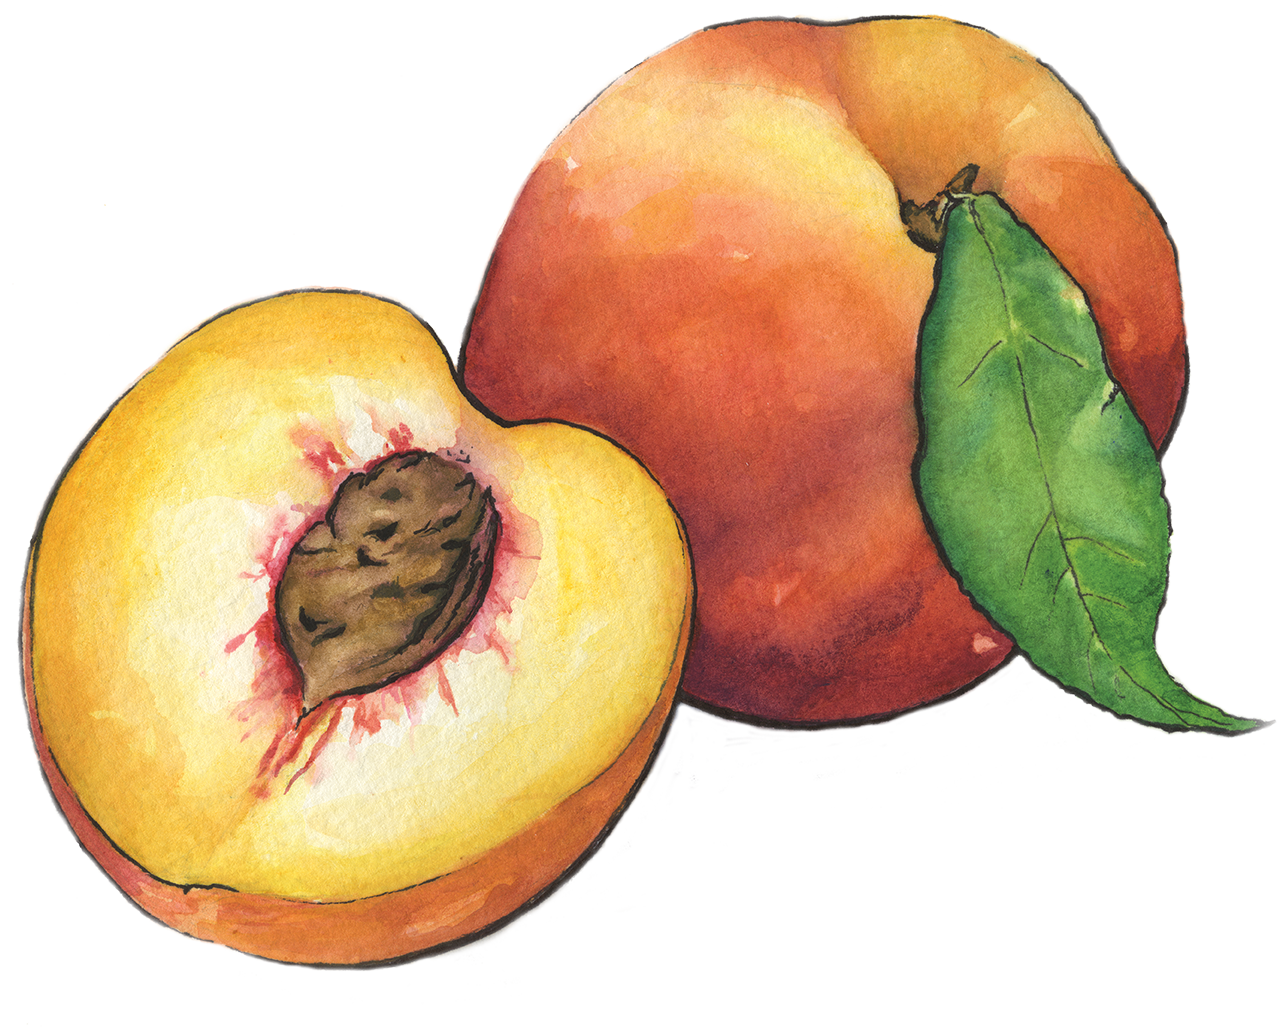 Peaches pictures strip pics 16